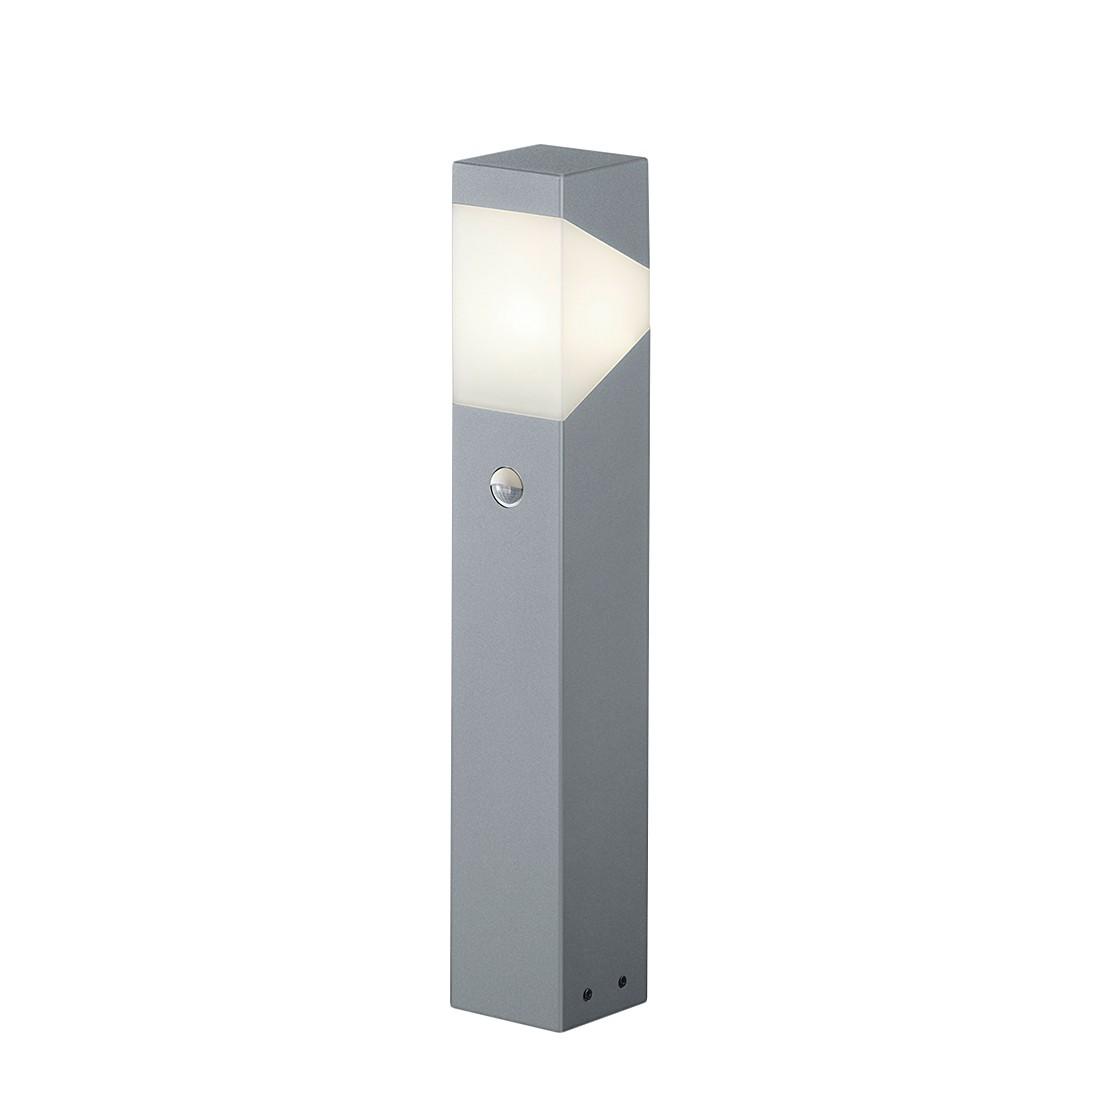 EEK A++, LED-Außenleuchte Rio 1-flammig - Aluminium Kunststoff - Silber, Trio